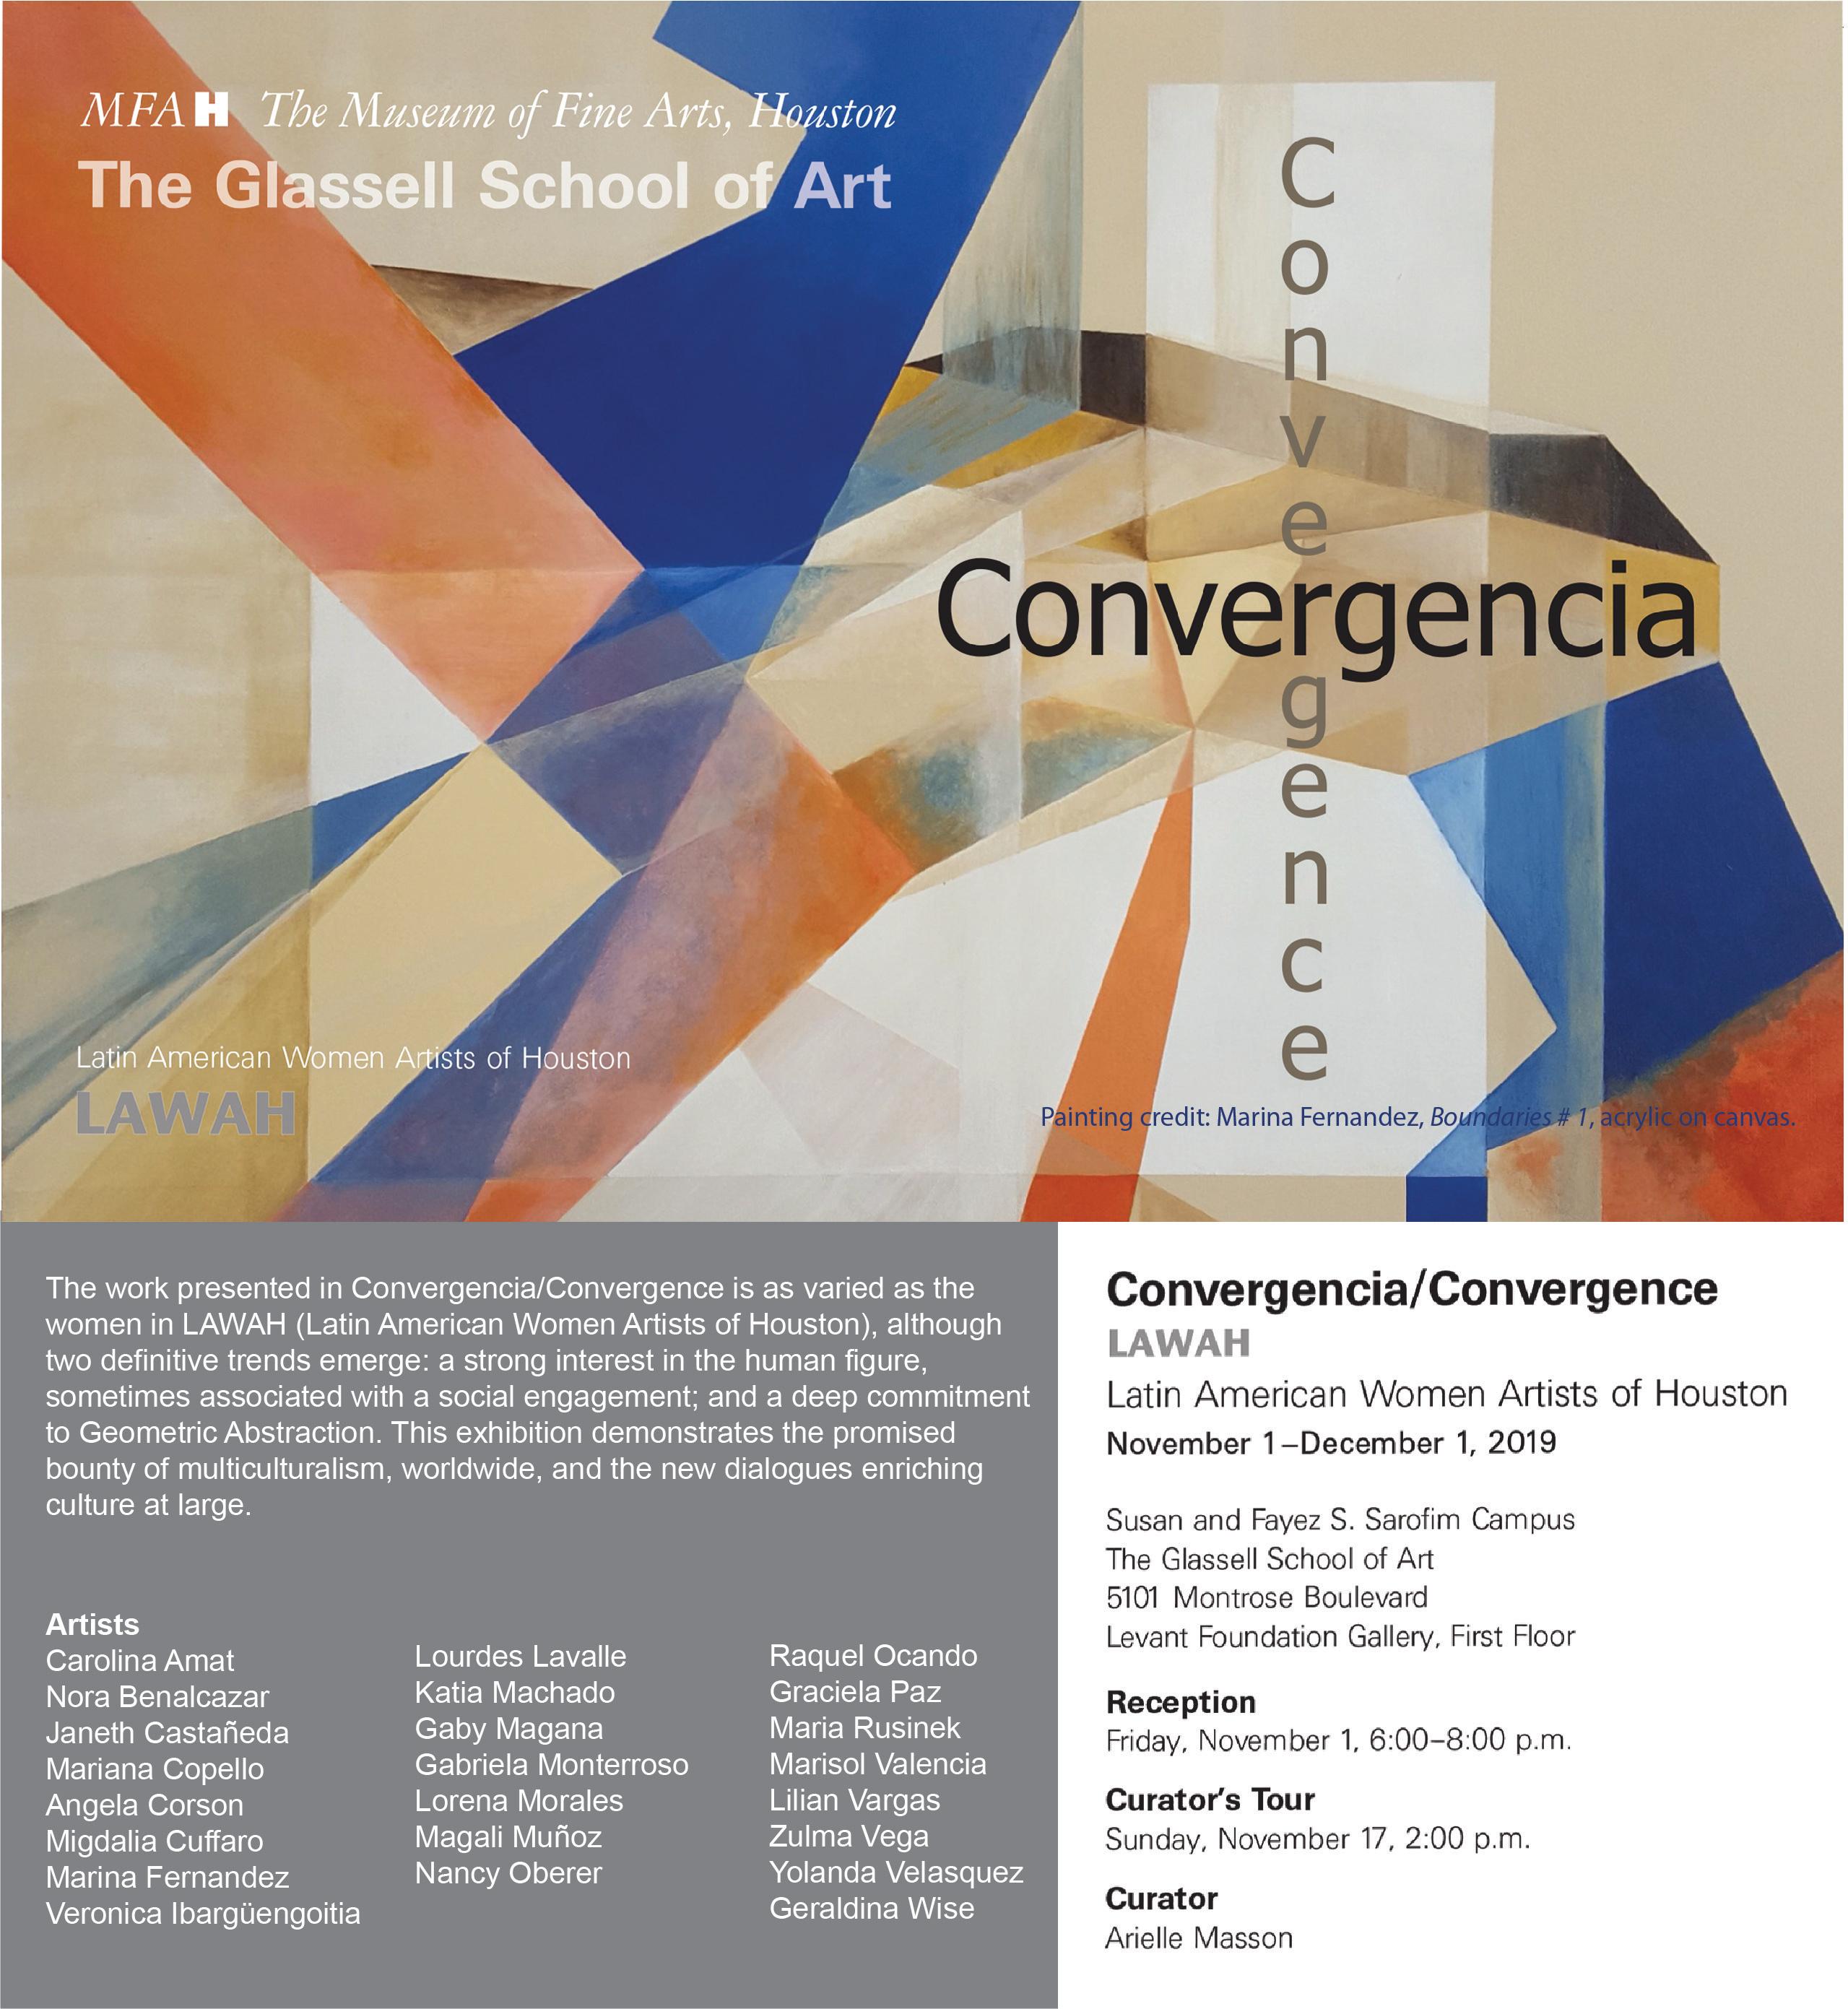 Convergence/Convergencia